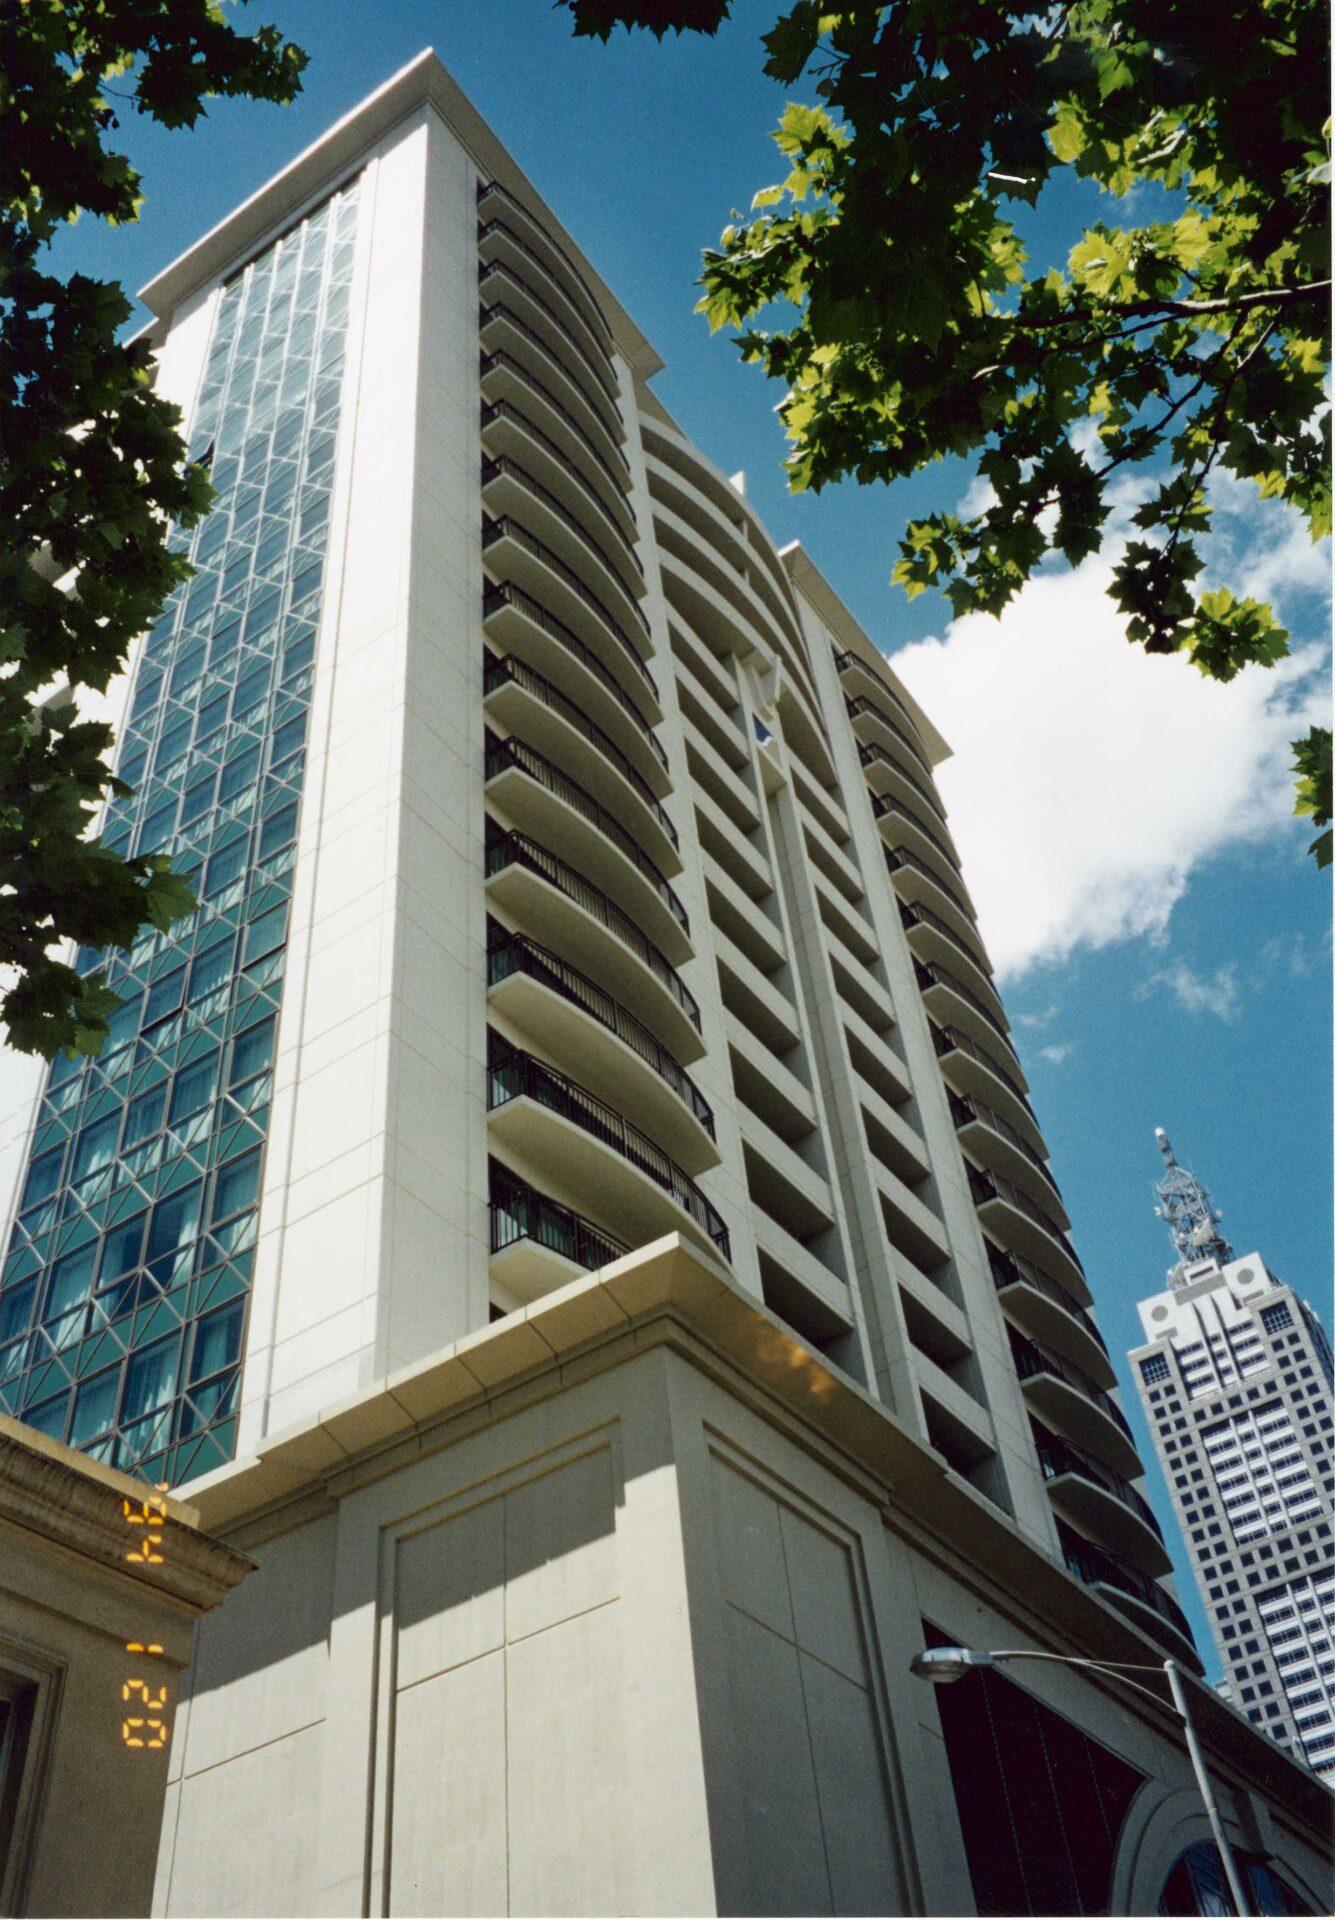 95016 Russell St 03 - Saville Grand, Melbourne Australia